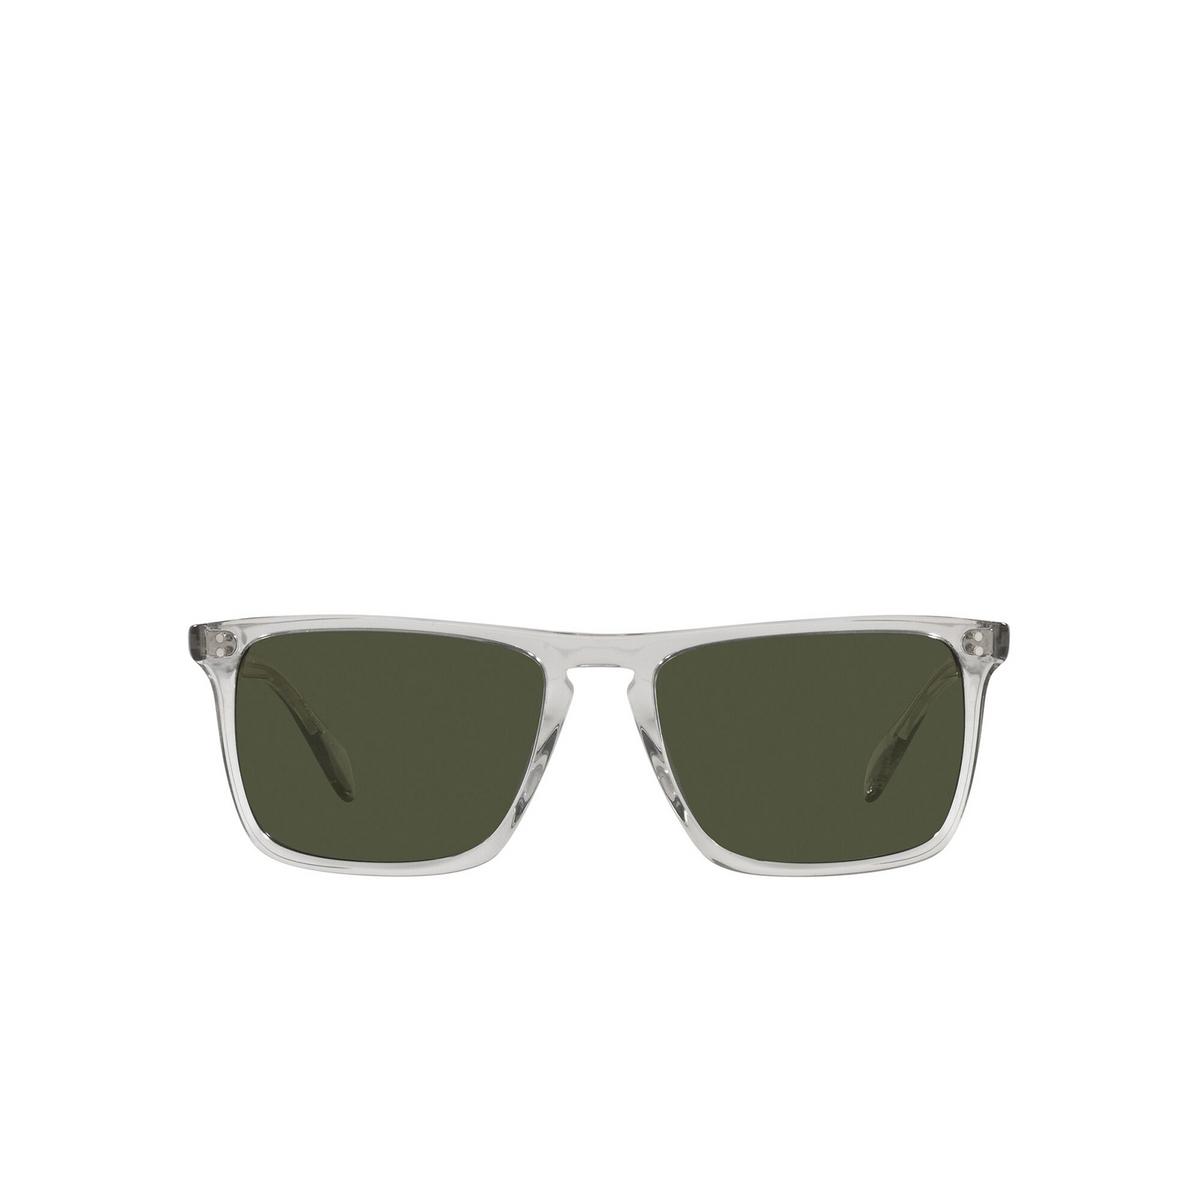 Oliver Peoples® Square Sunglasses: Bernardo OV5189S color Black Diamond 166952 - front view.